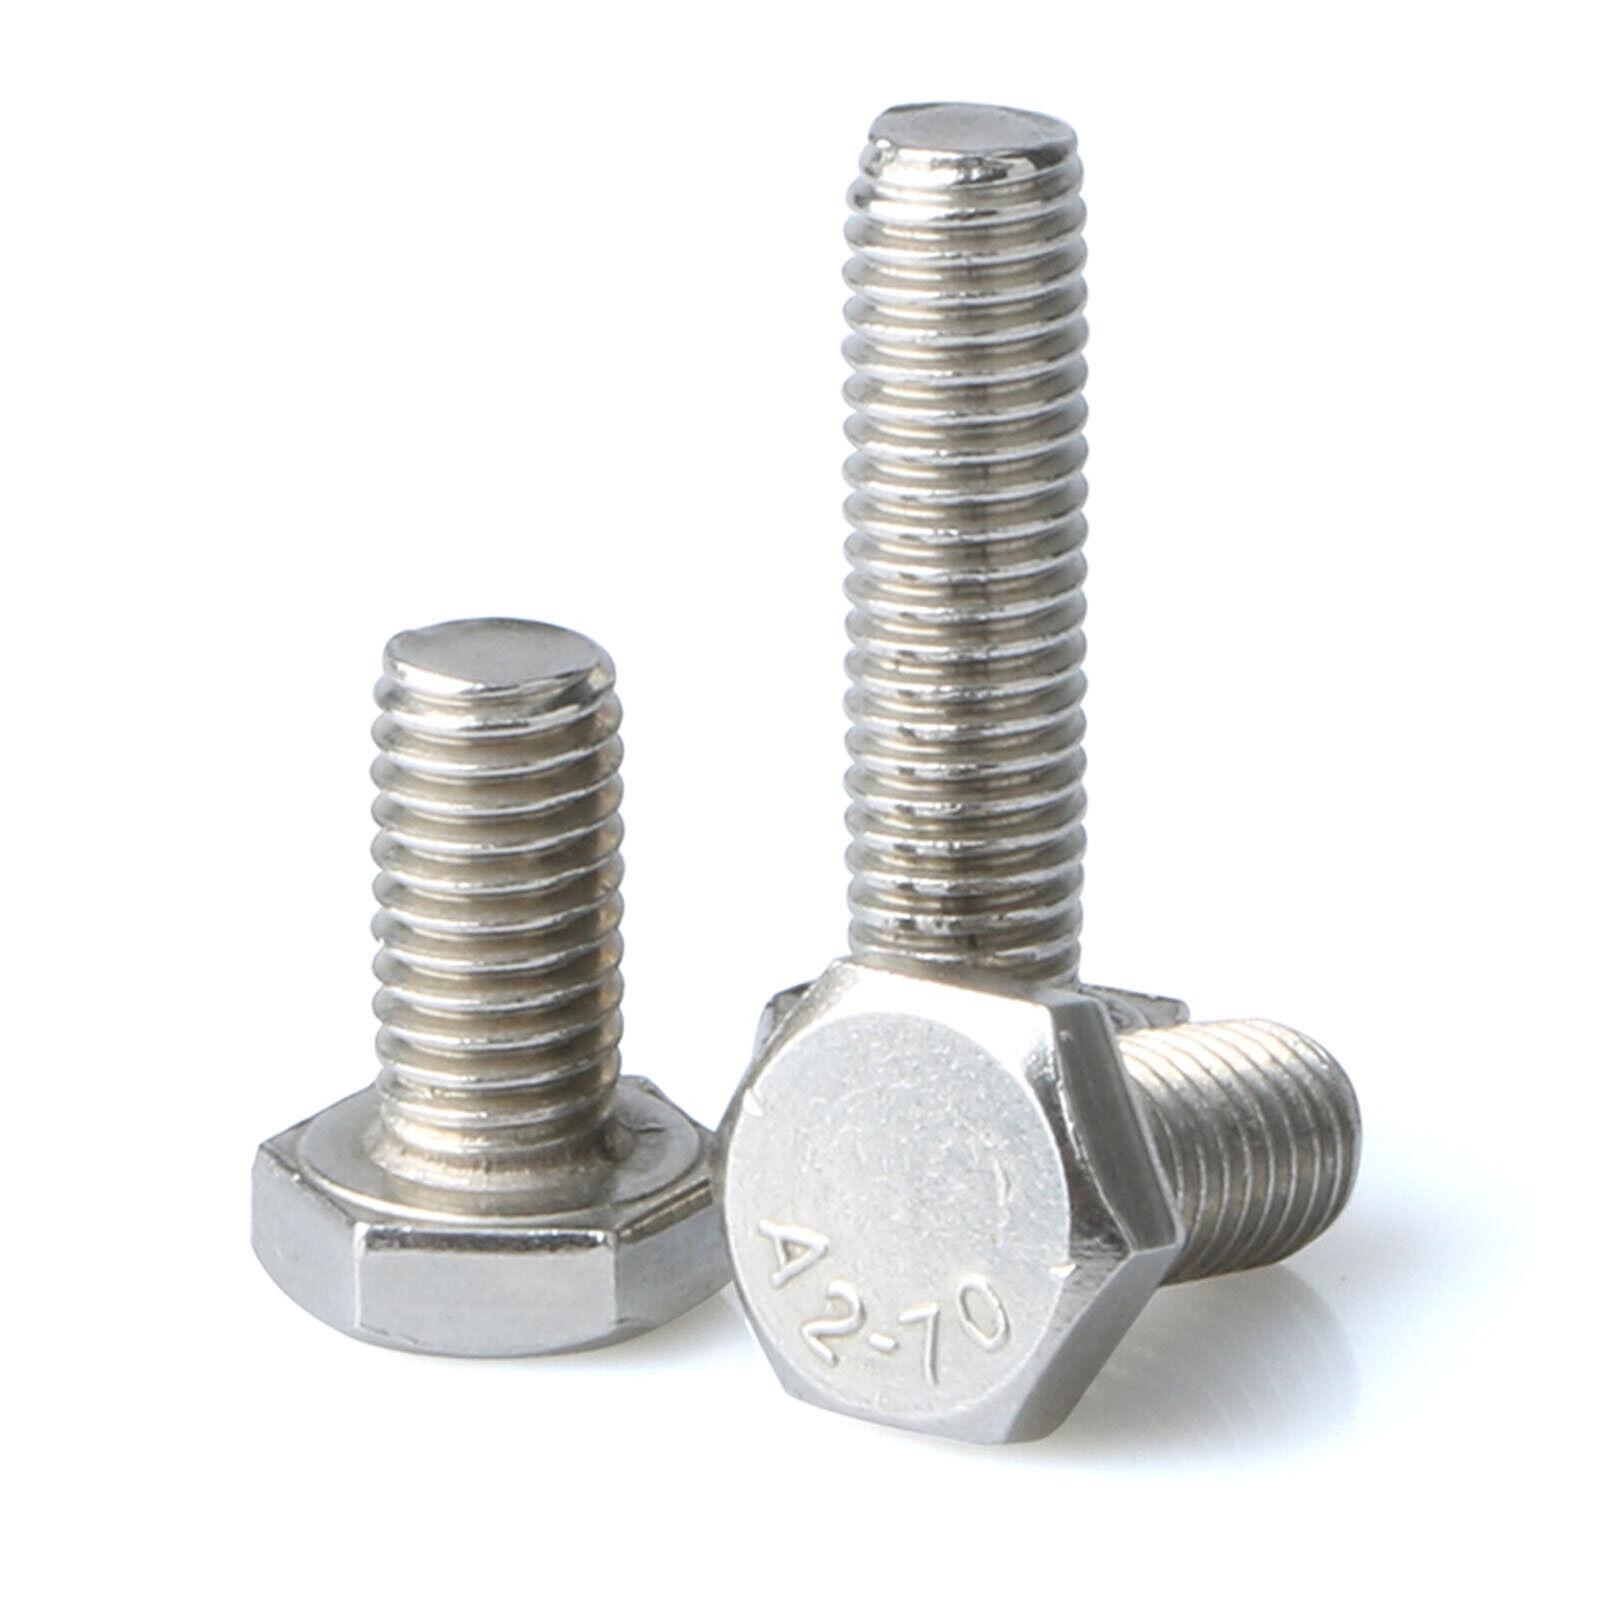 M2//M2.5//M3//M3.5//M4//M5//M6 Screw Thread Taps DIY Ratchet Wrench Taps Z9Y0H